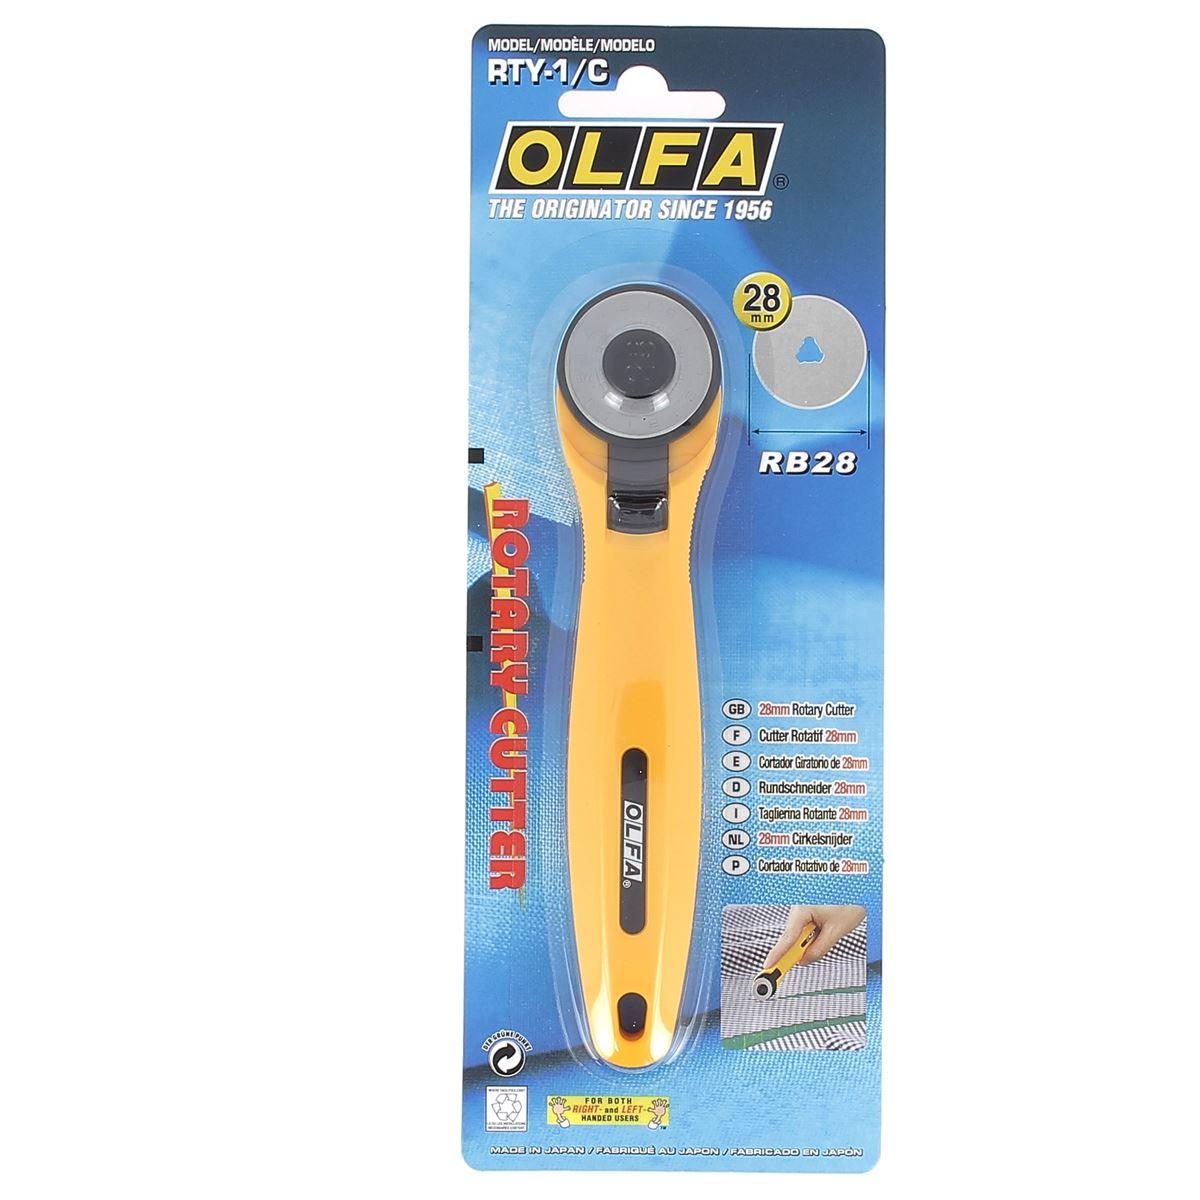 Cutter rotatif OLFA - diamètre 28 mm - RTY-1G